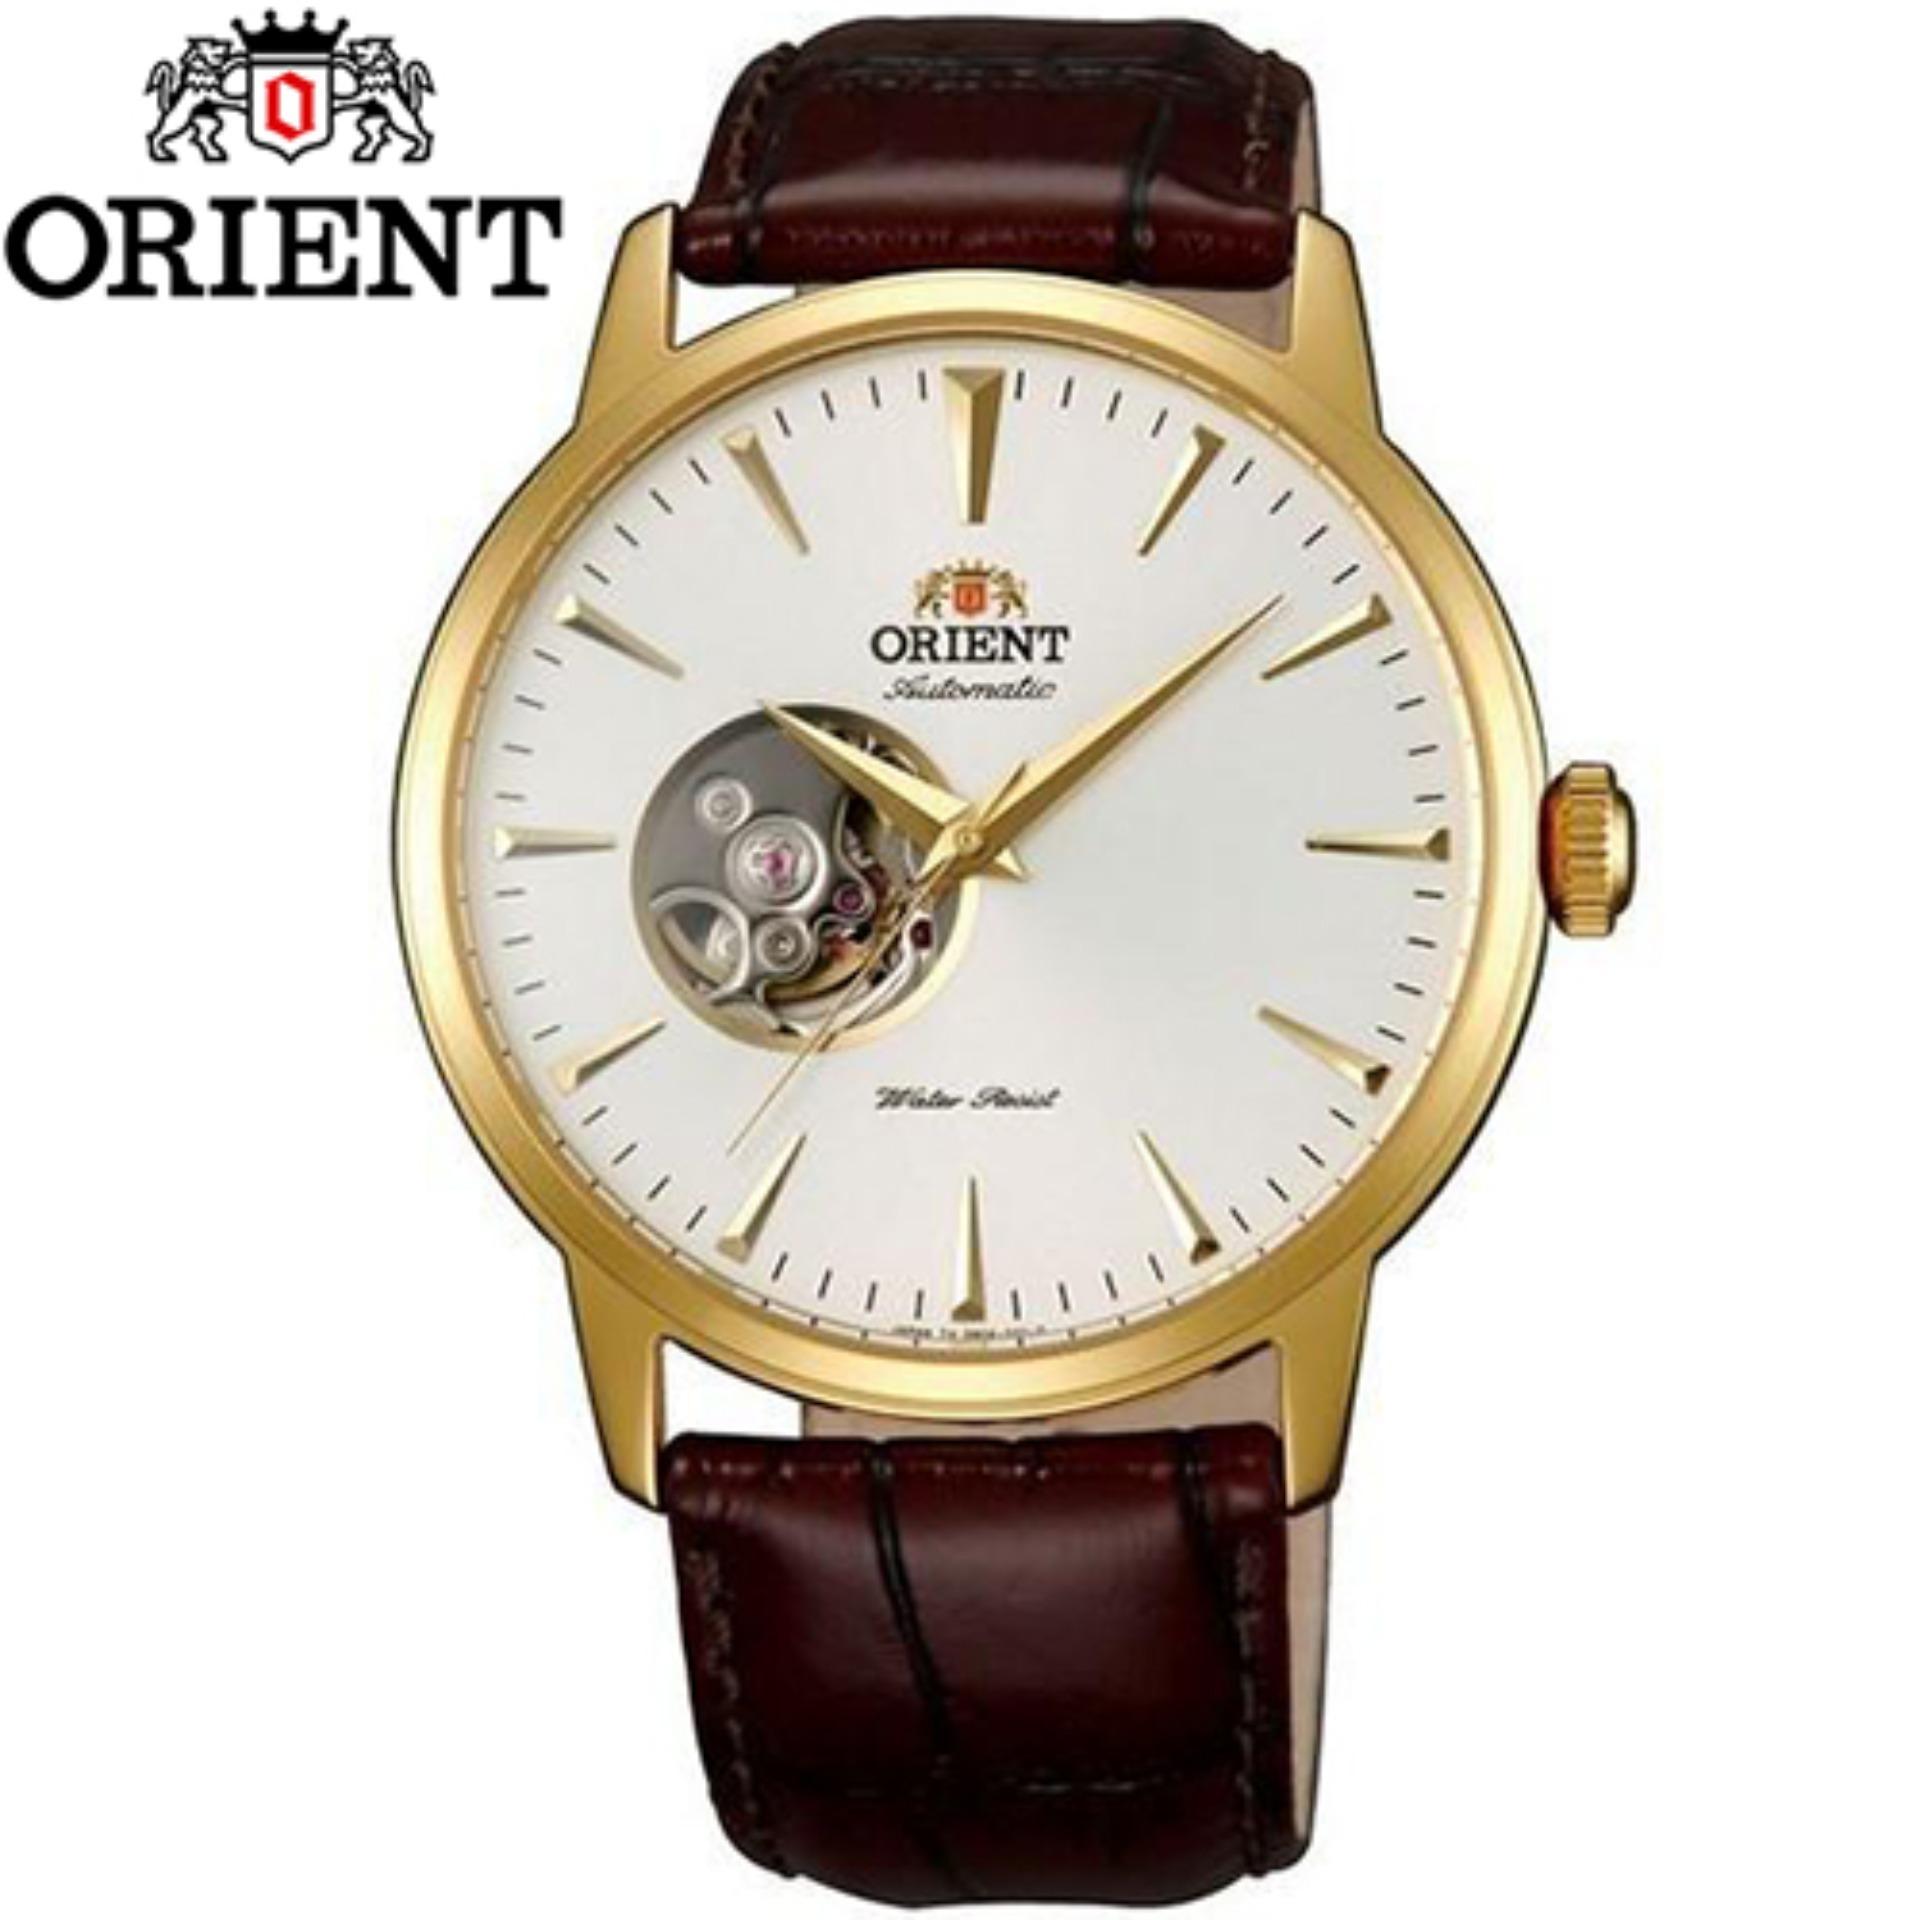 Đồng hồ nam dây da máy cơ automatic Orient FDB08003W0